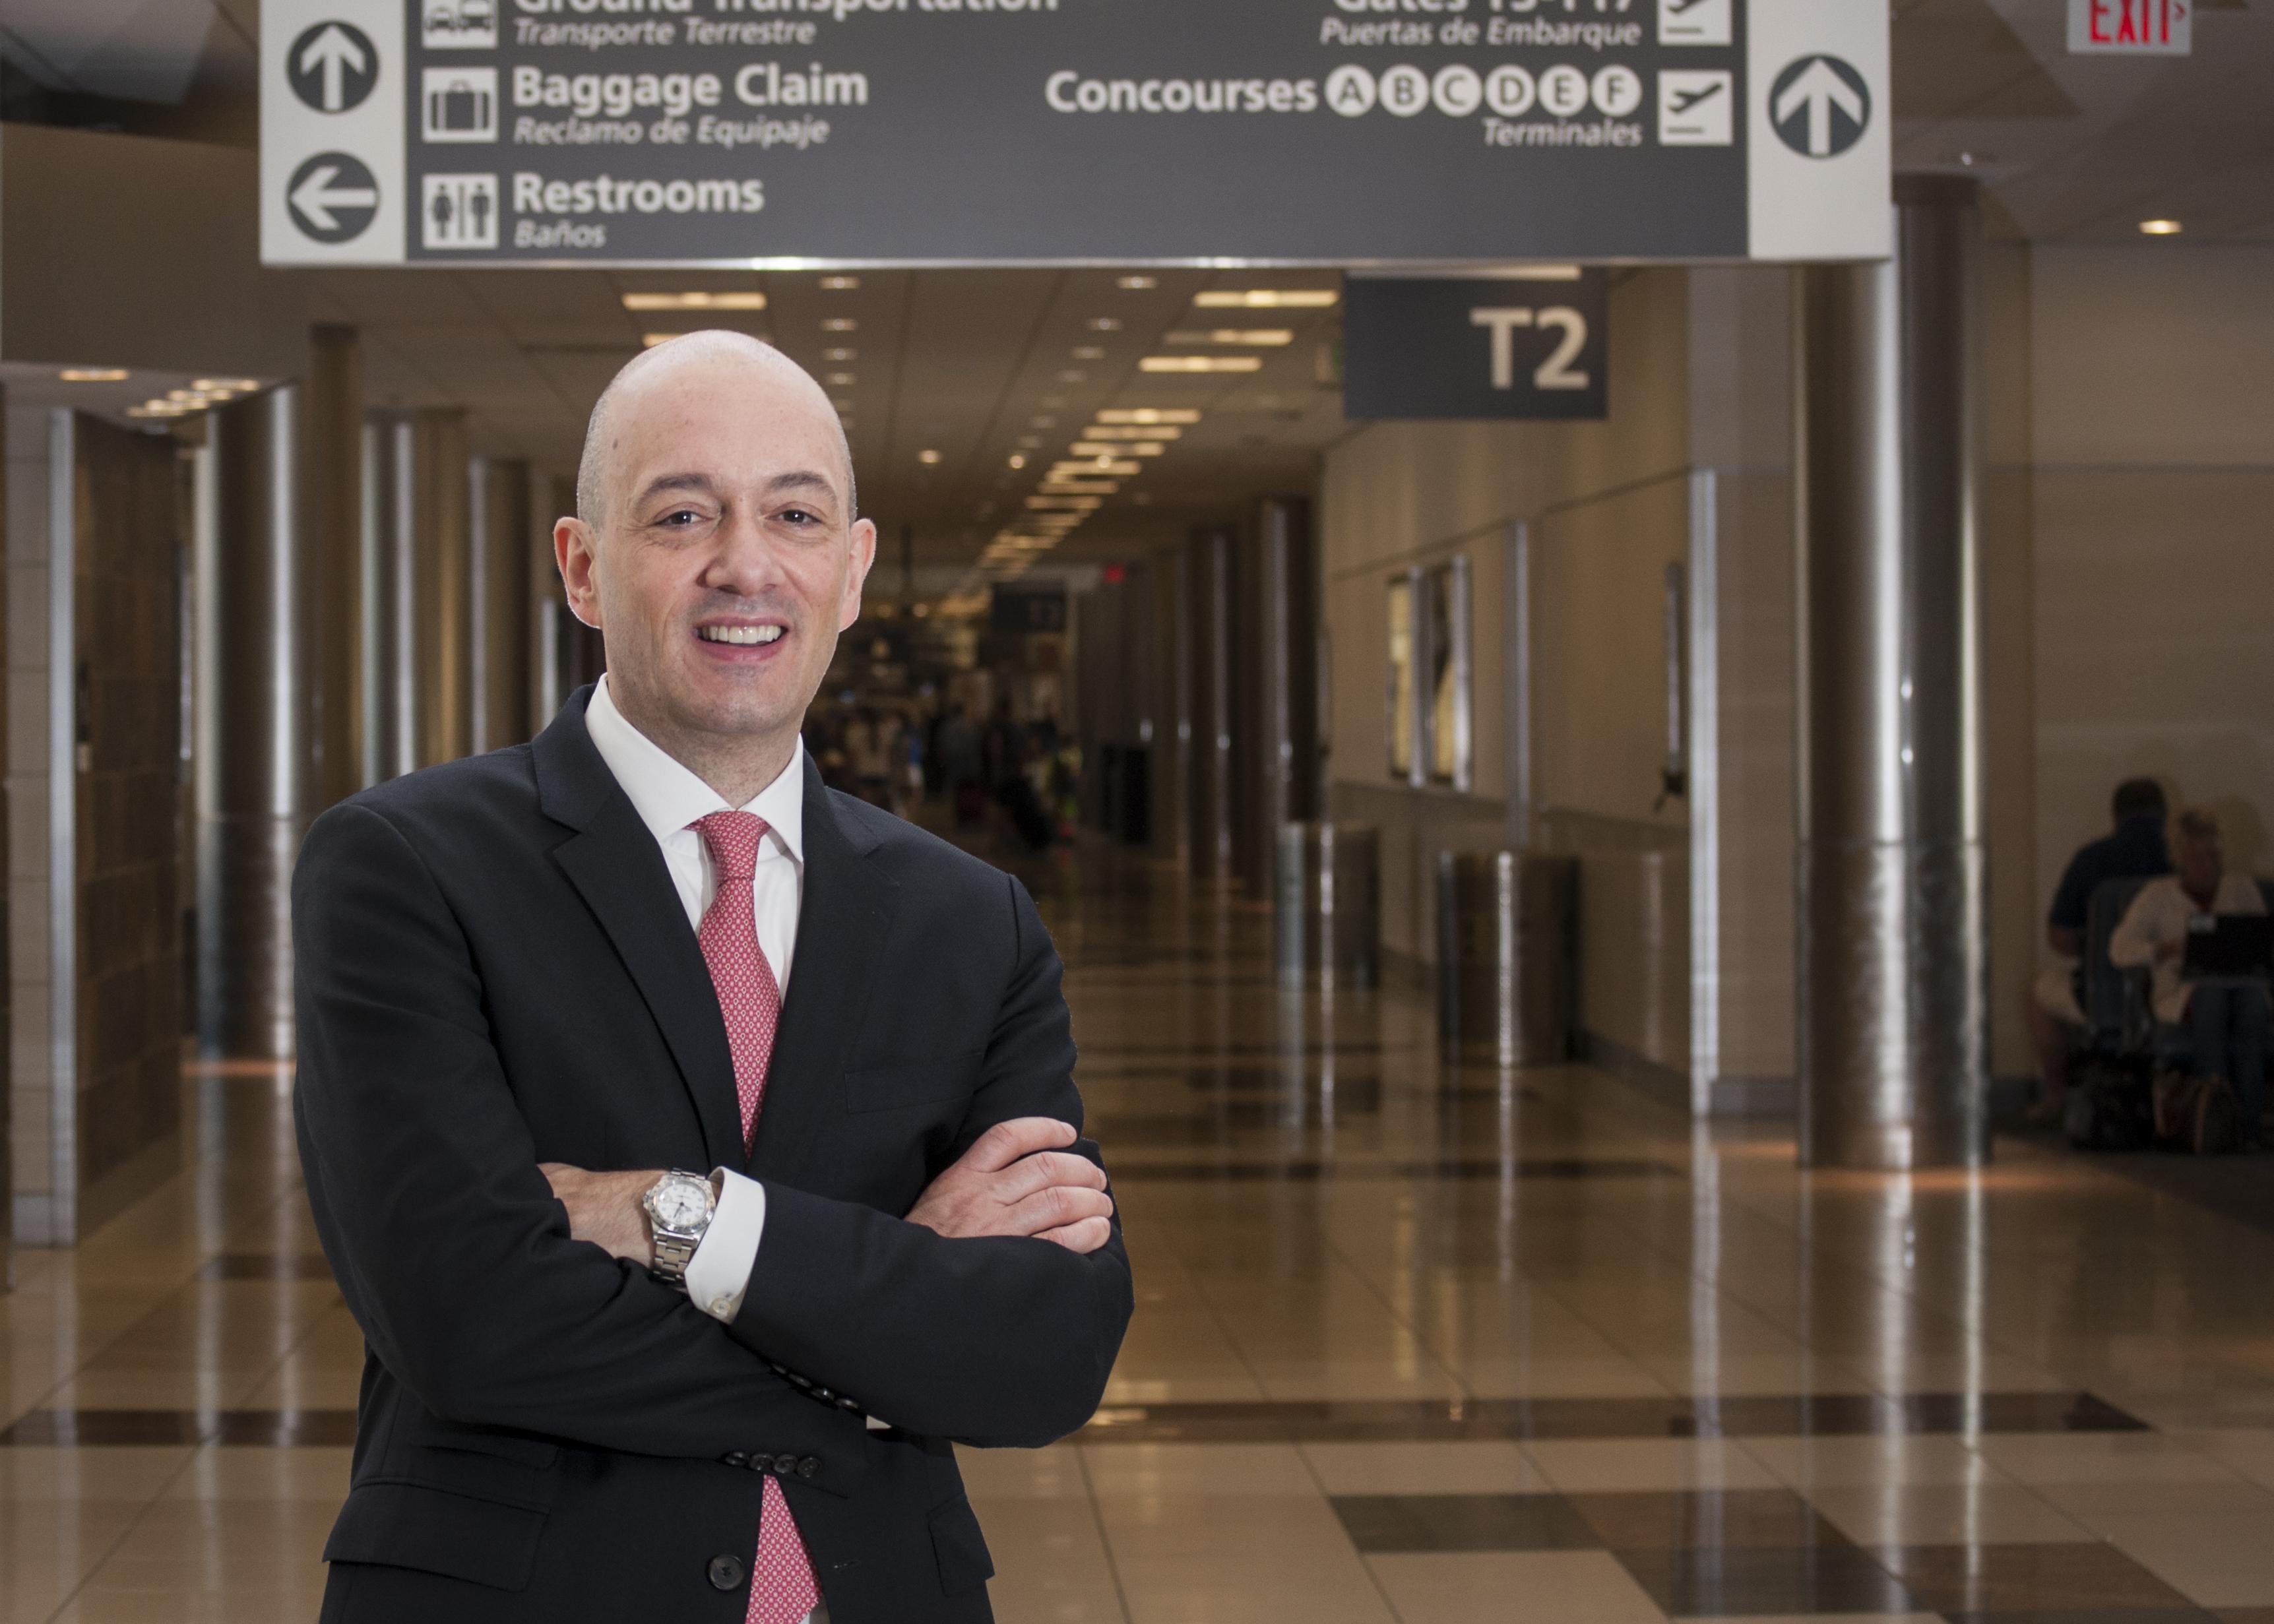 Man standing in airport - Nicolas Ferri